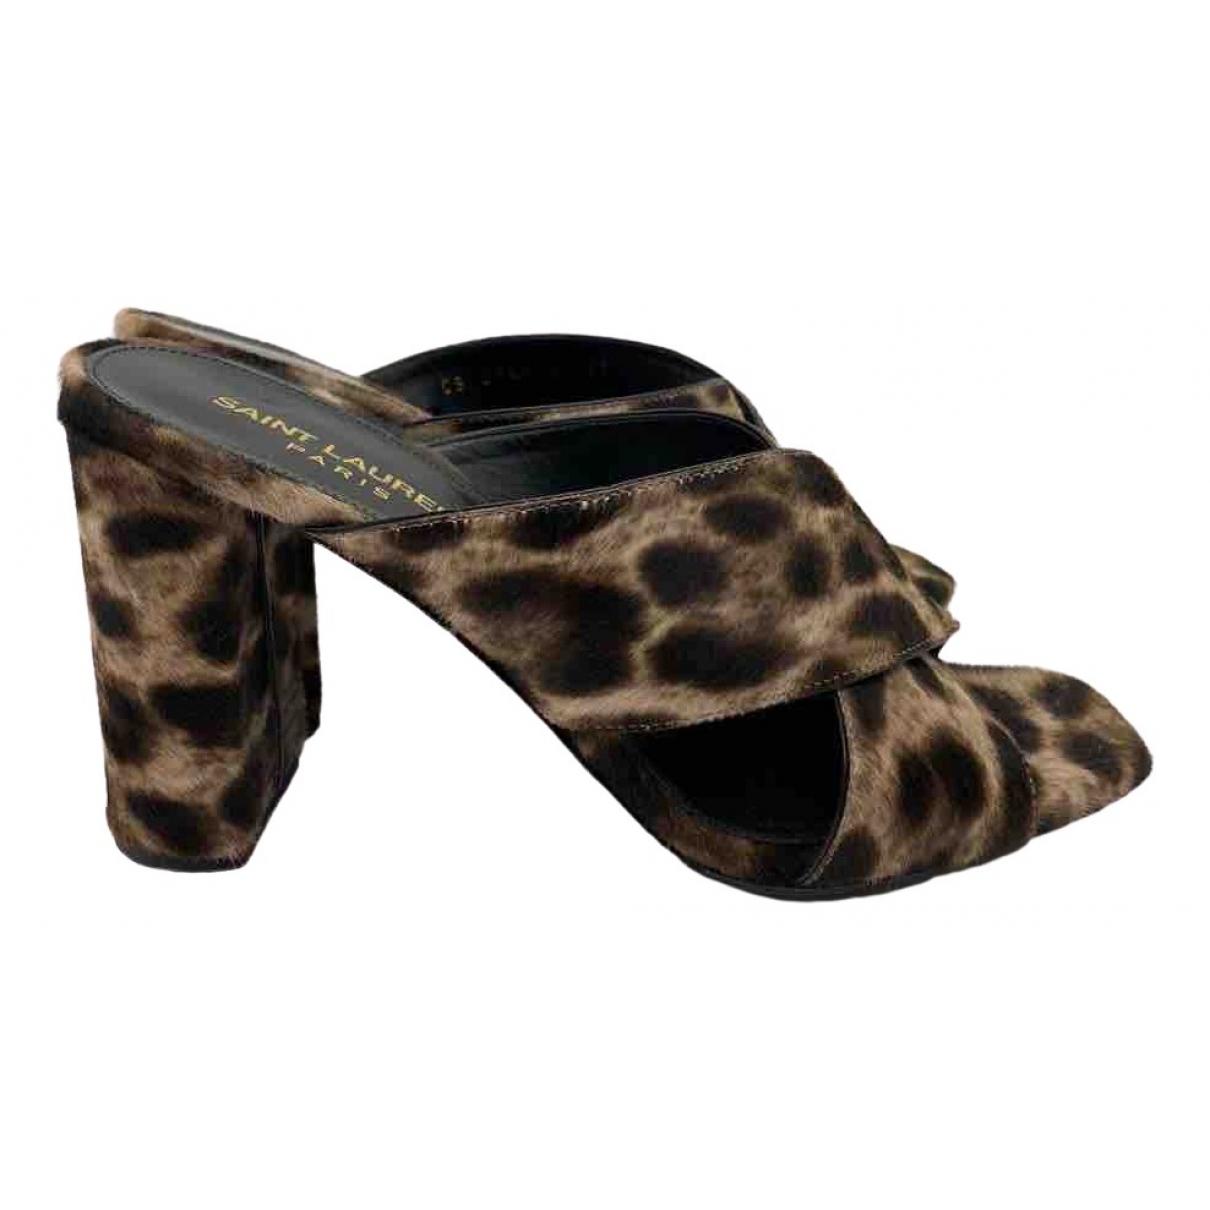 Saint Laurent Loulou Brown Pony-style calfskin Sandals for Women 37 EU